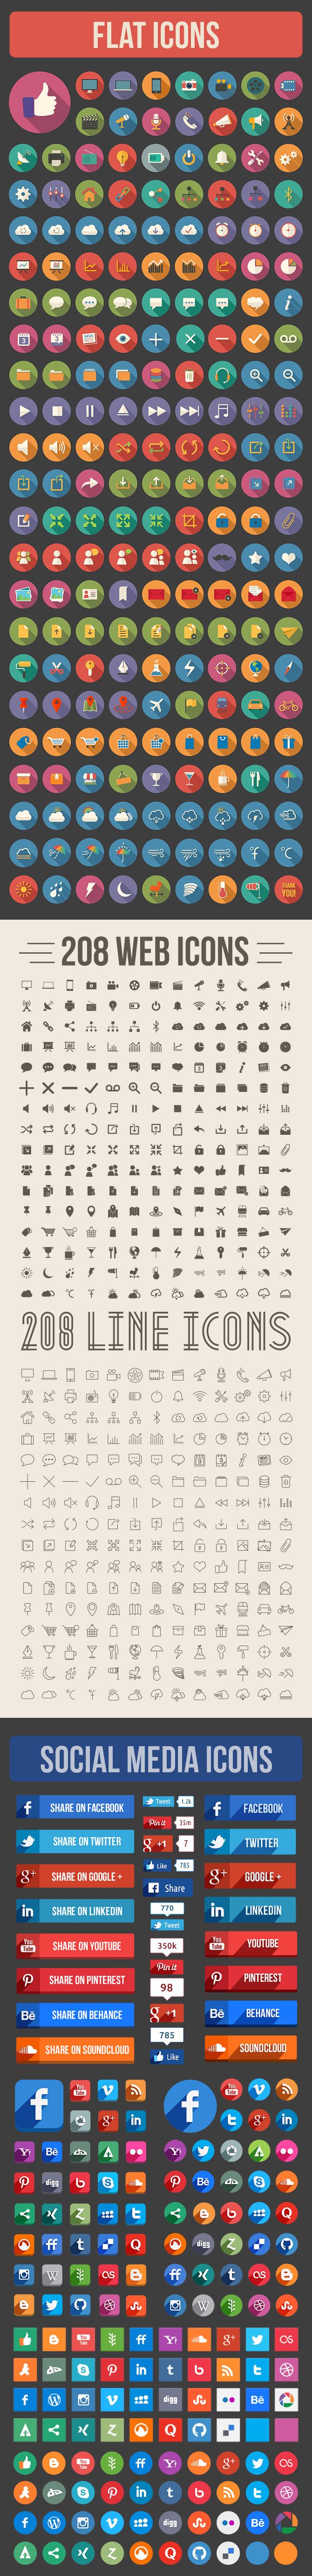 Icon Bundle Icons, Flat design and Web design inspiration